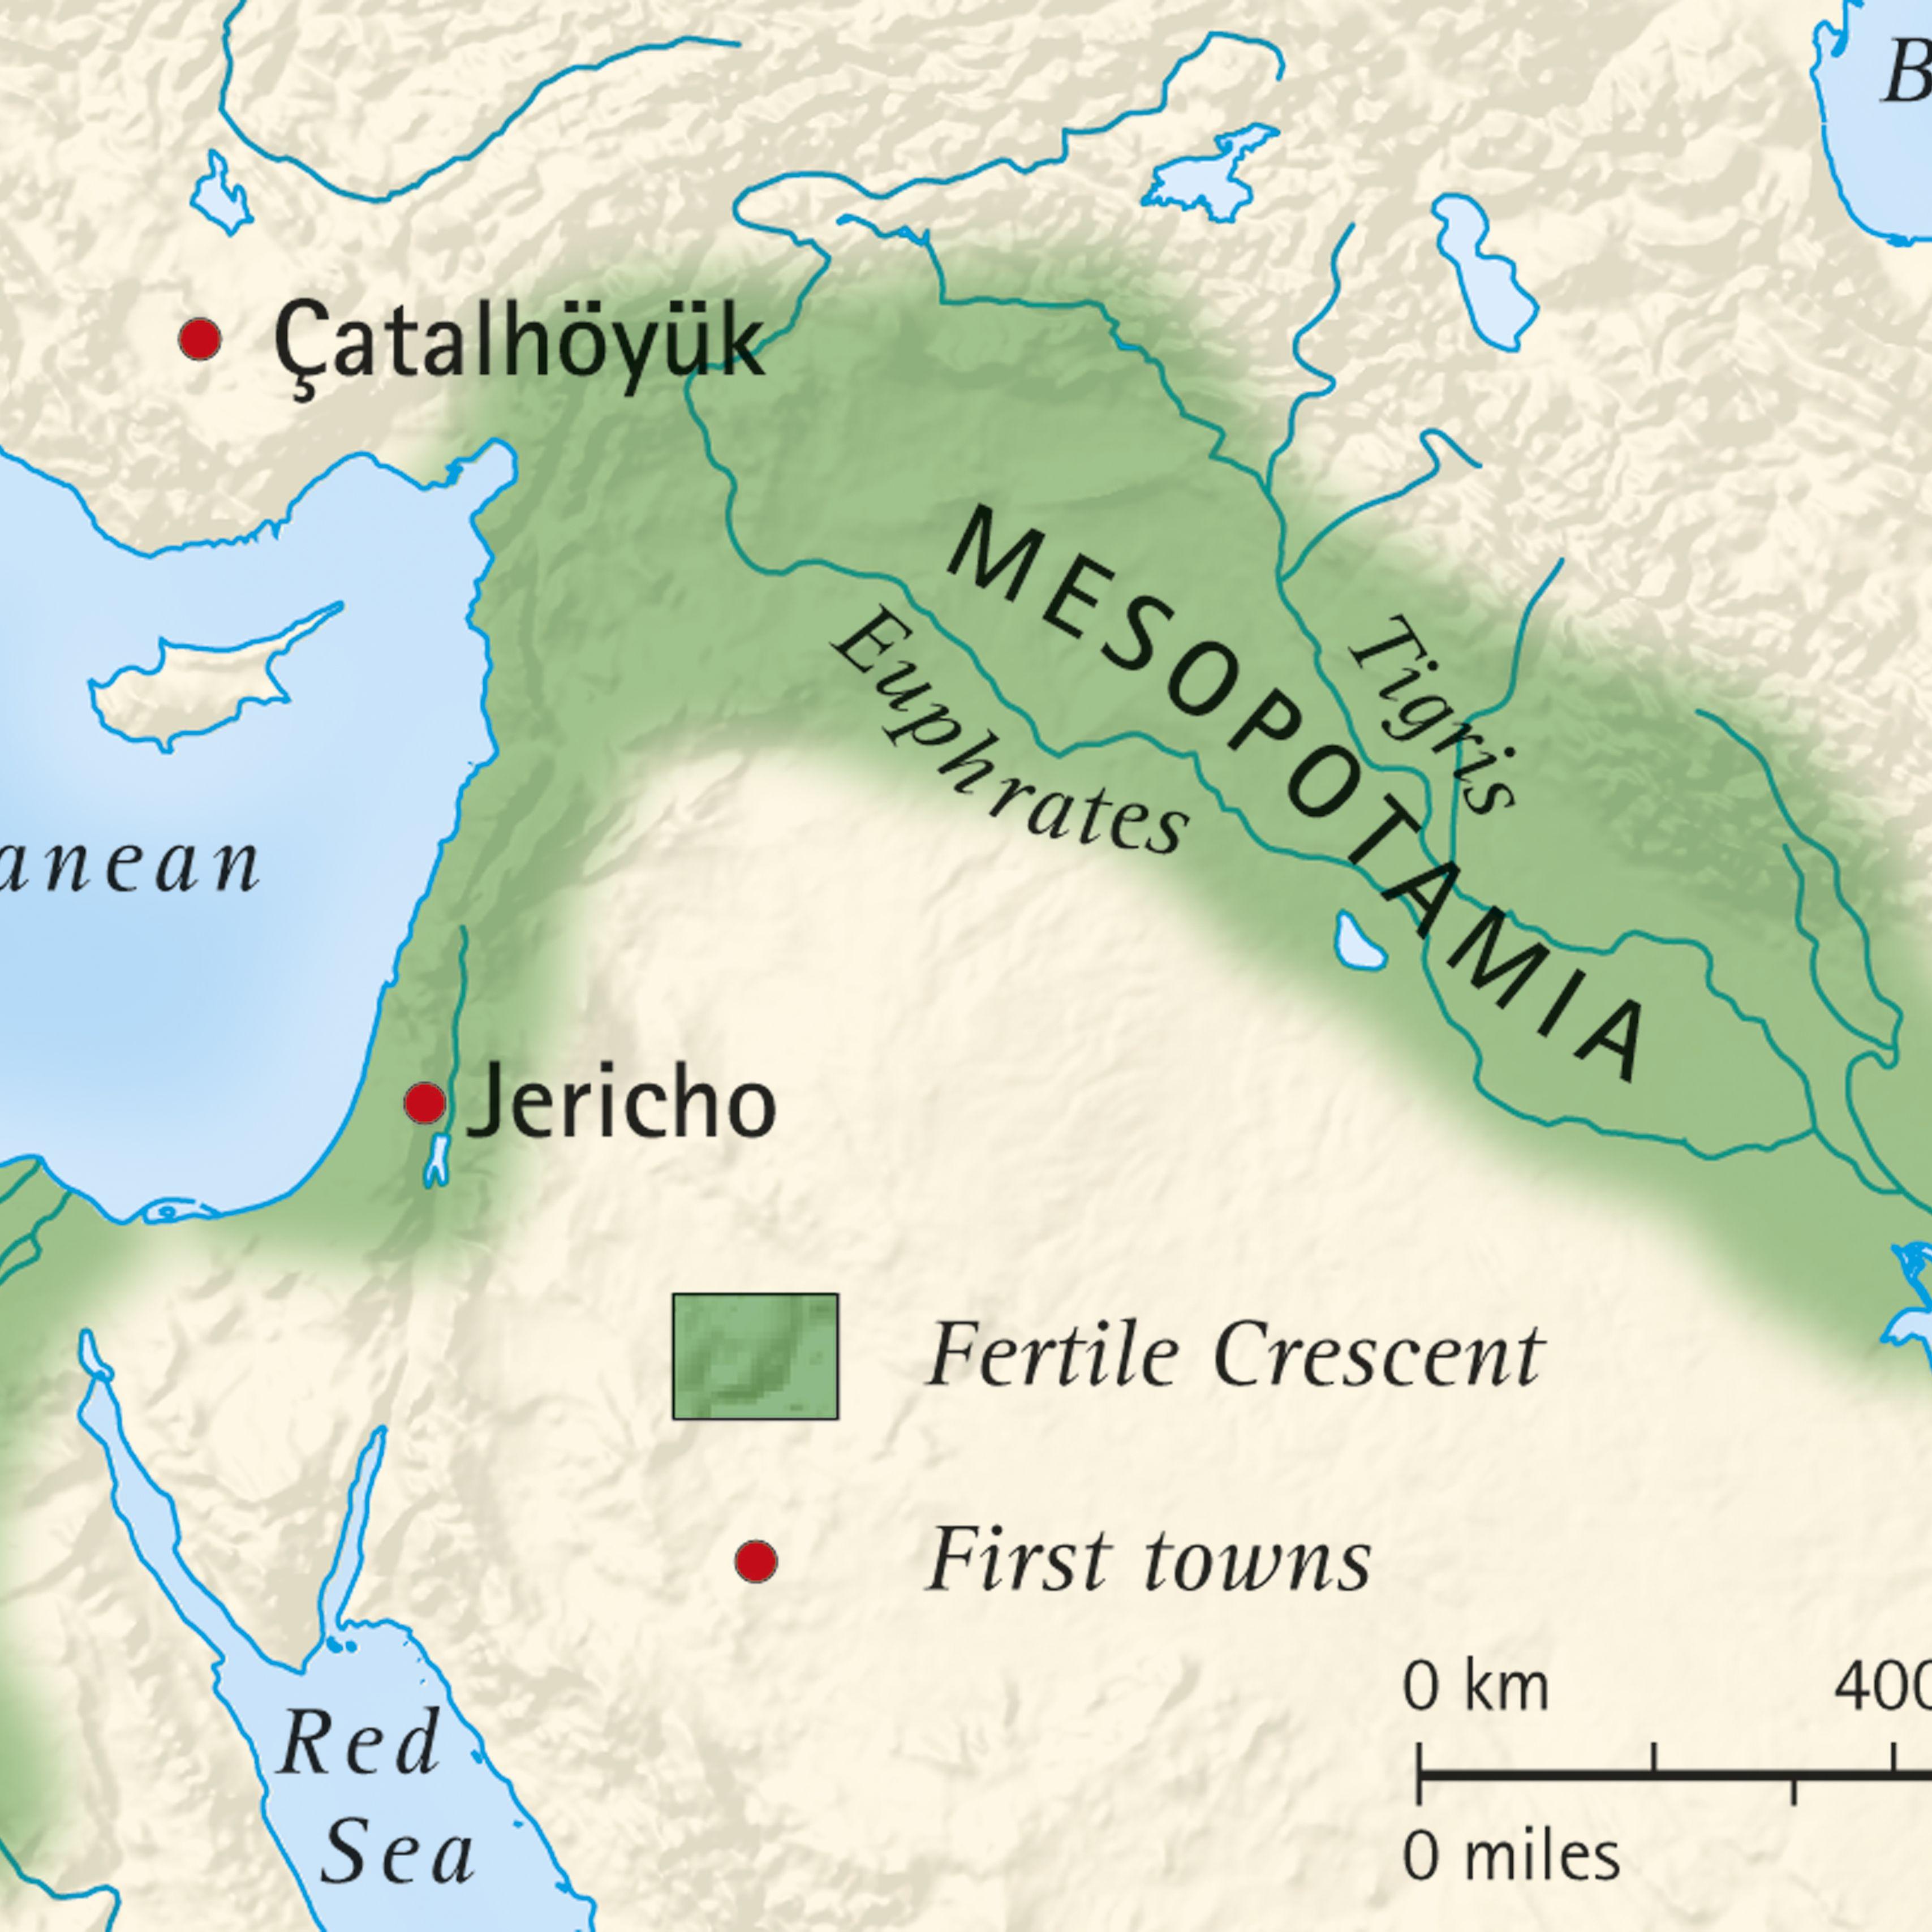 What Was the Fertile Crescent? Map Fertile Crescent on sargon of akkad, israel map, ethiopia map, the fertile cresent map, west bank map, mesopotamian map, arabian sea map, mediterranean sea map, egypt map, sumer map, arabian desert map, epic of gilgamesh, dead sea map, levant map, black sea map, persian gulf map, gaza strip map, cradle of civilization, arabian peninsula map, neolithic revolution, elburz mountains map, zagros mountains map, zagros mountains, sahara map, ancient mesopotamia map,